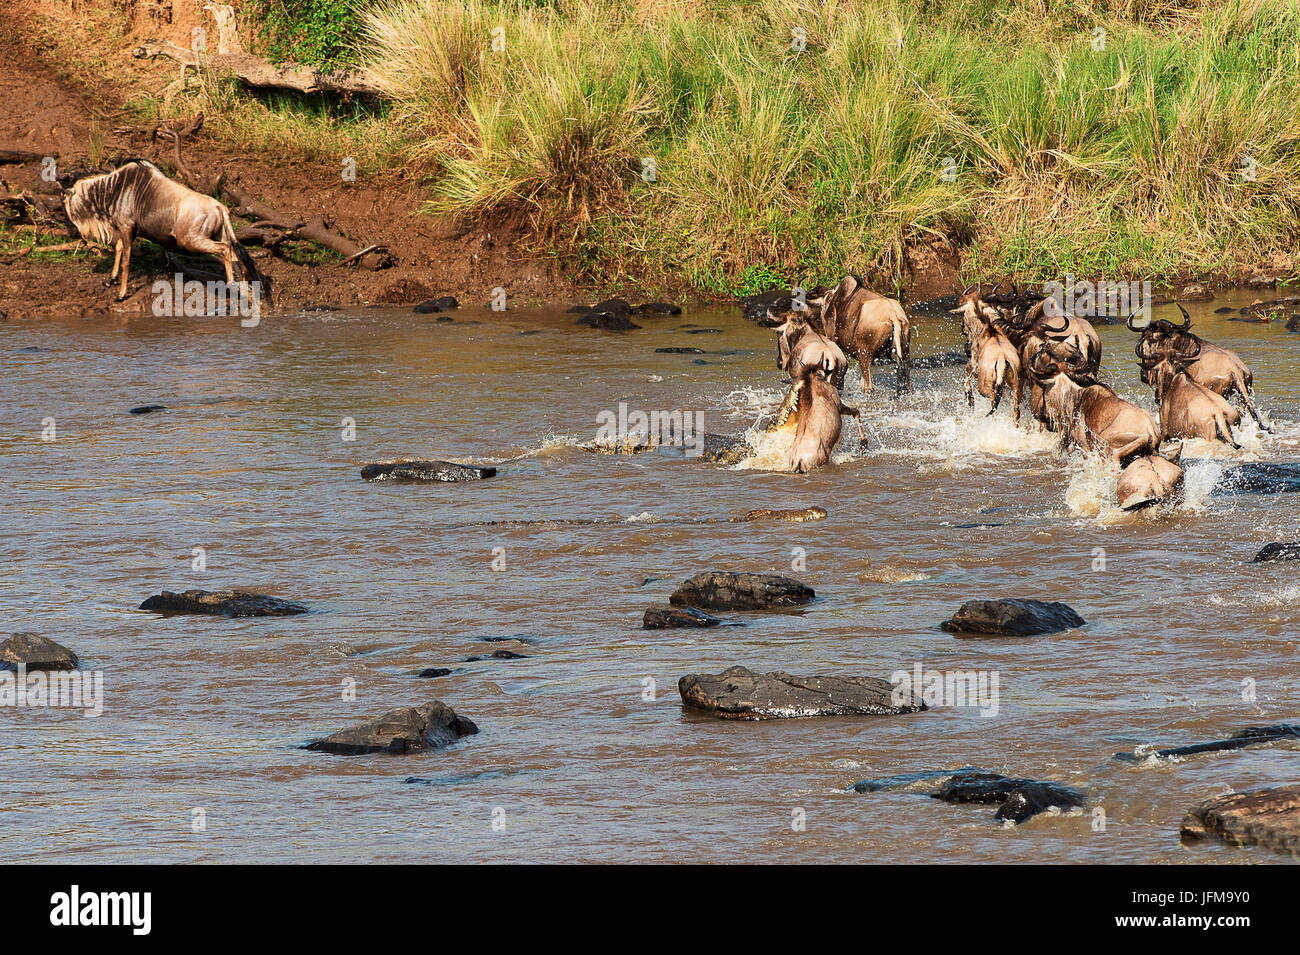 Masai Mara Park, Kenya, Africa A crocodile attacks a wildebeest while crossing a river in the Masai Mara - Stock Image